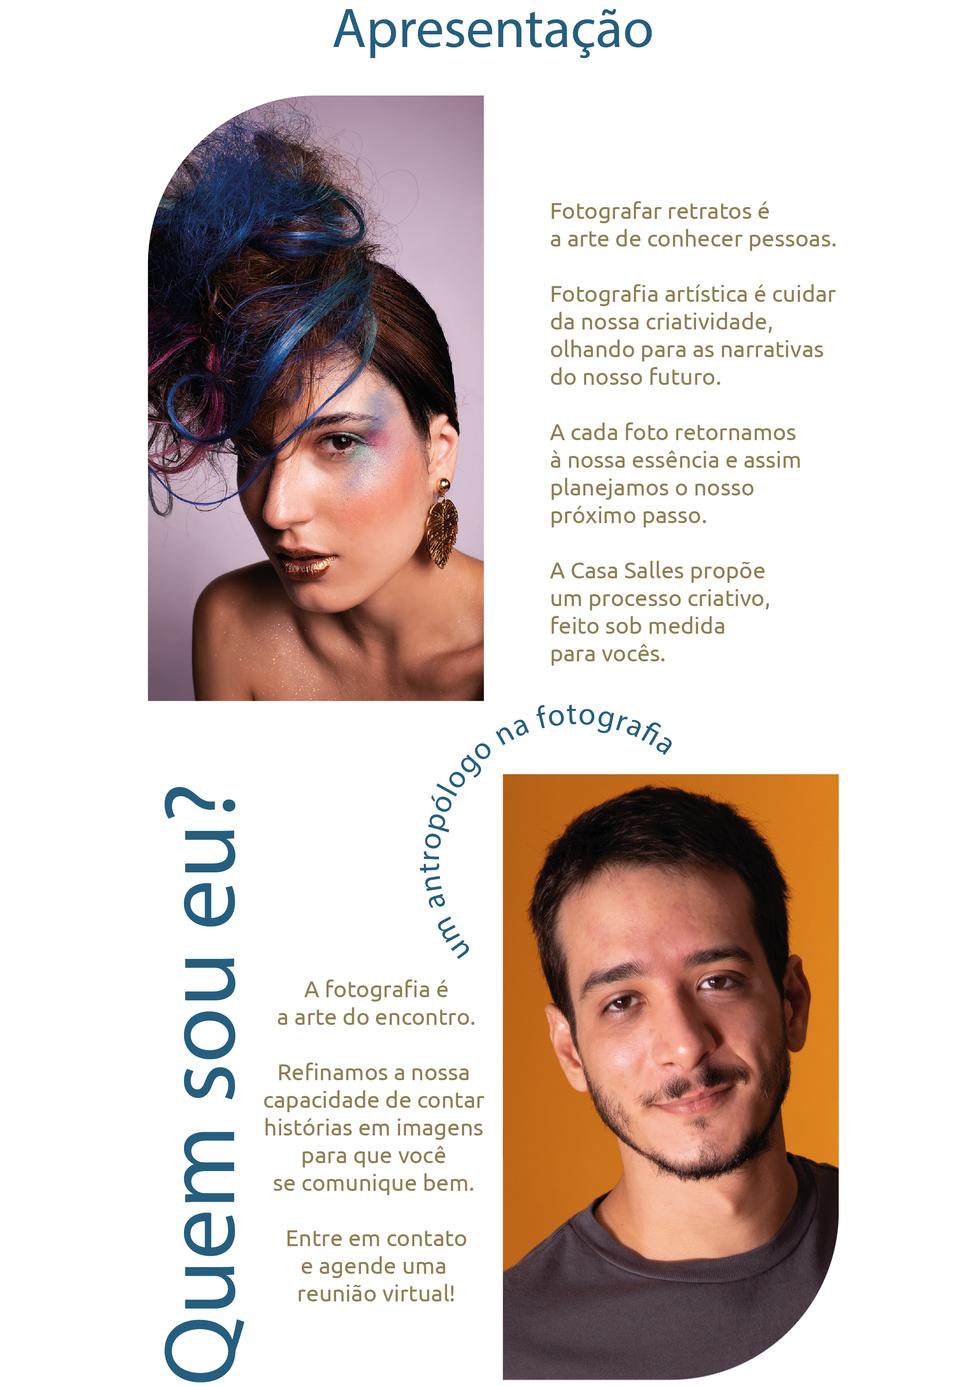 Pedro Salles 02_Prancheta 1.png